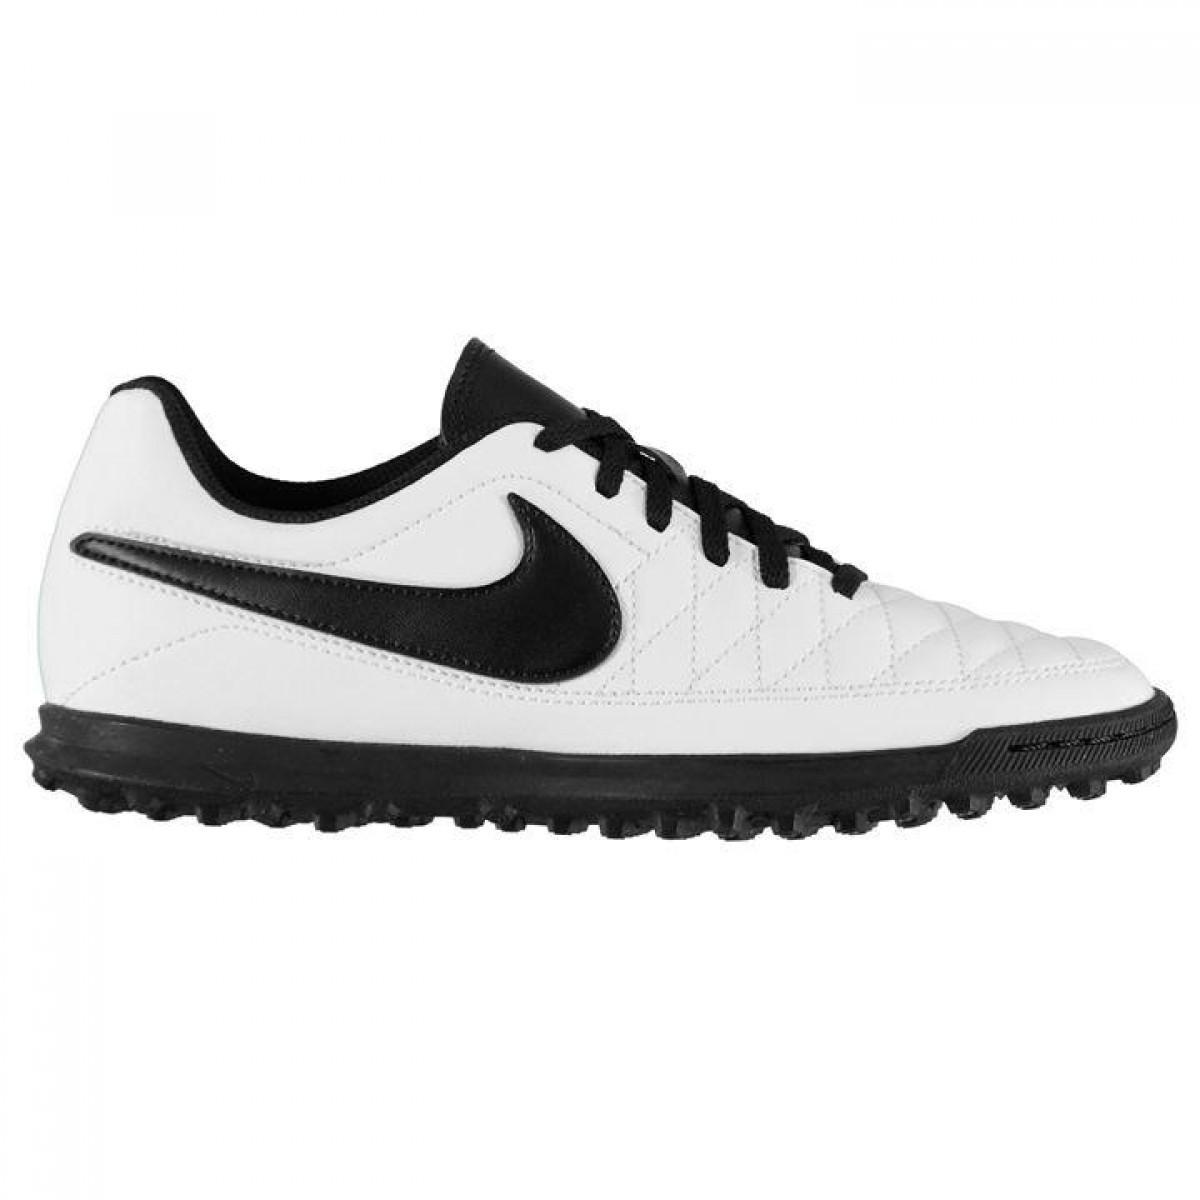 5f8a774a Бутсы Nike Majestry TF White/Black - Оригинал - FAIR - оригинальная одежда  и обувь